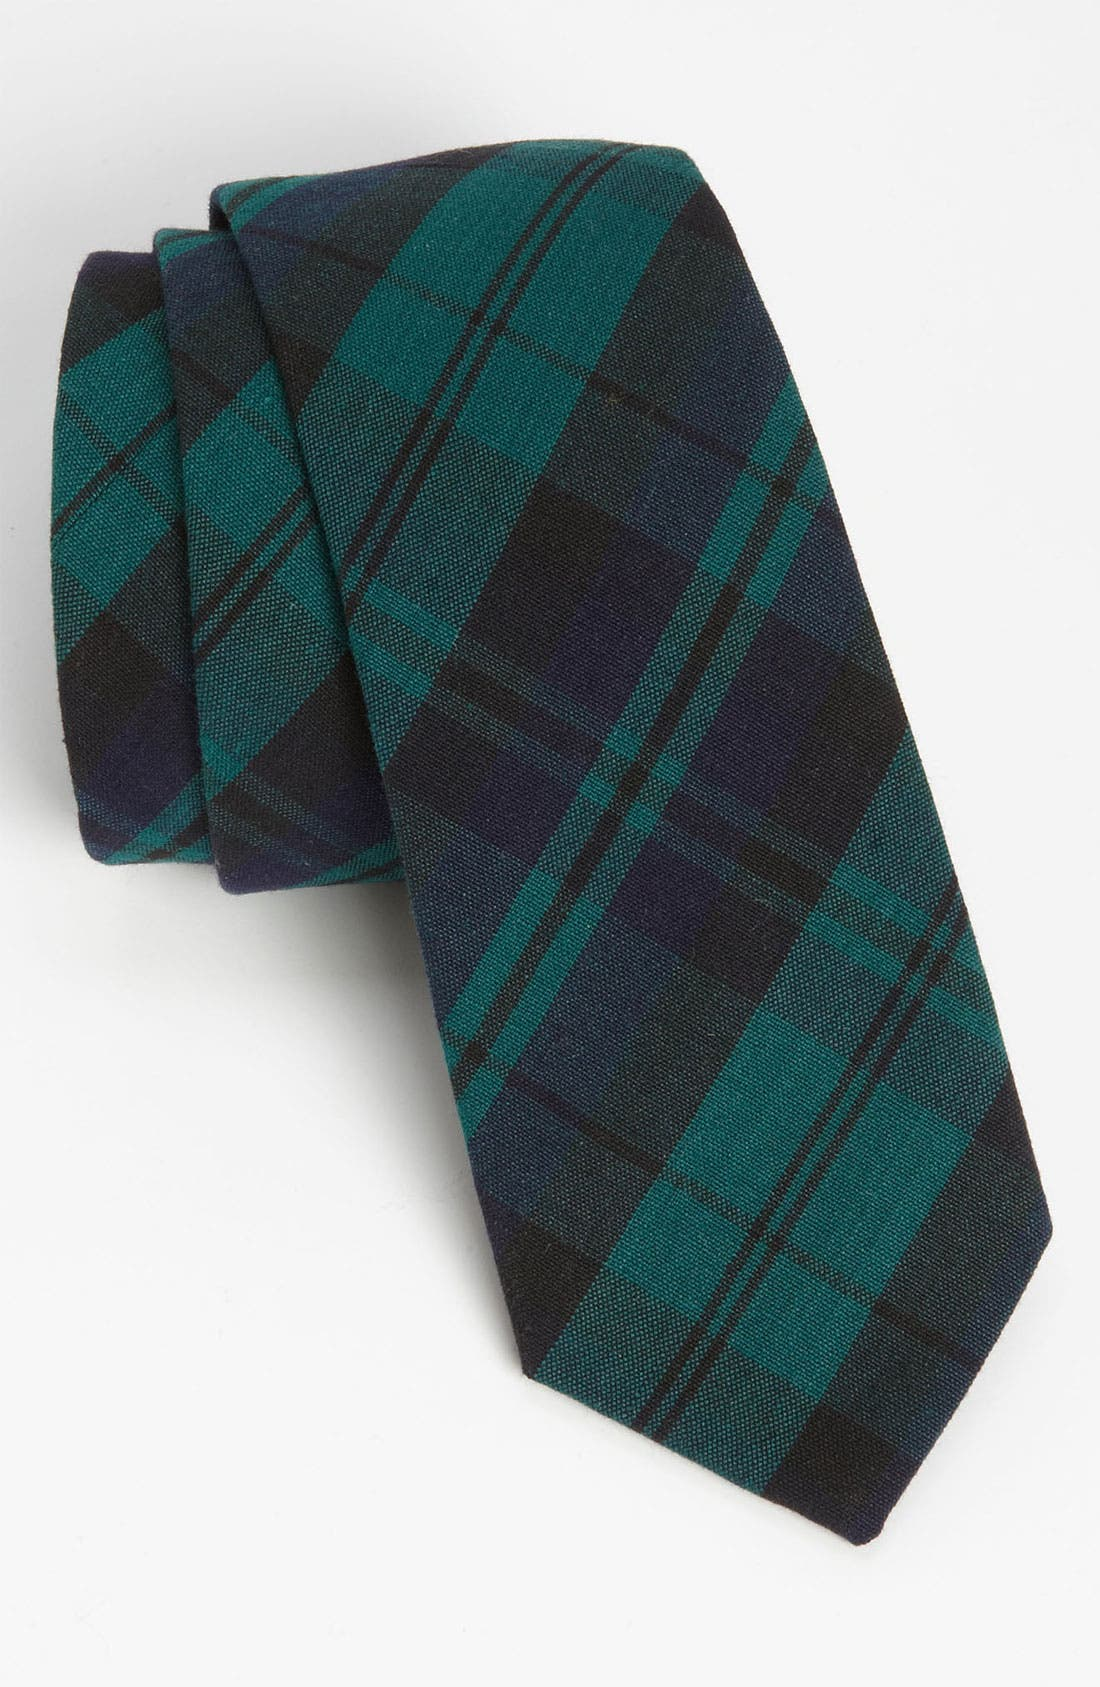 Main Image - Gitman Woven Cotton Tie